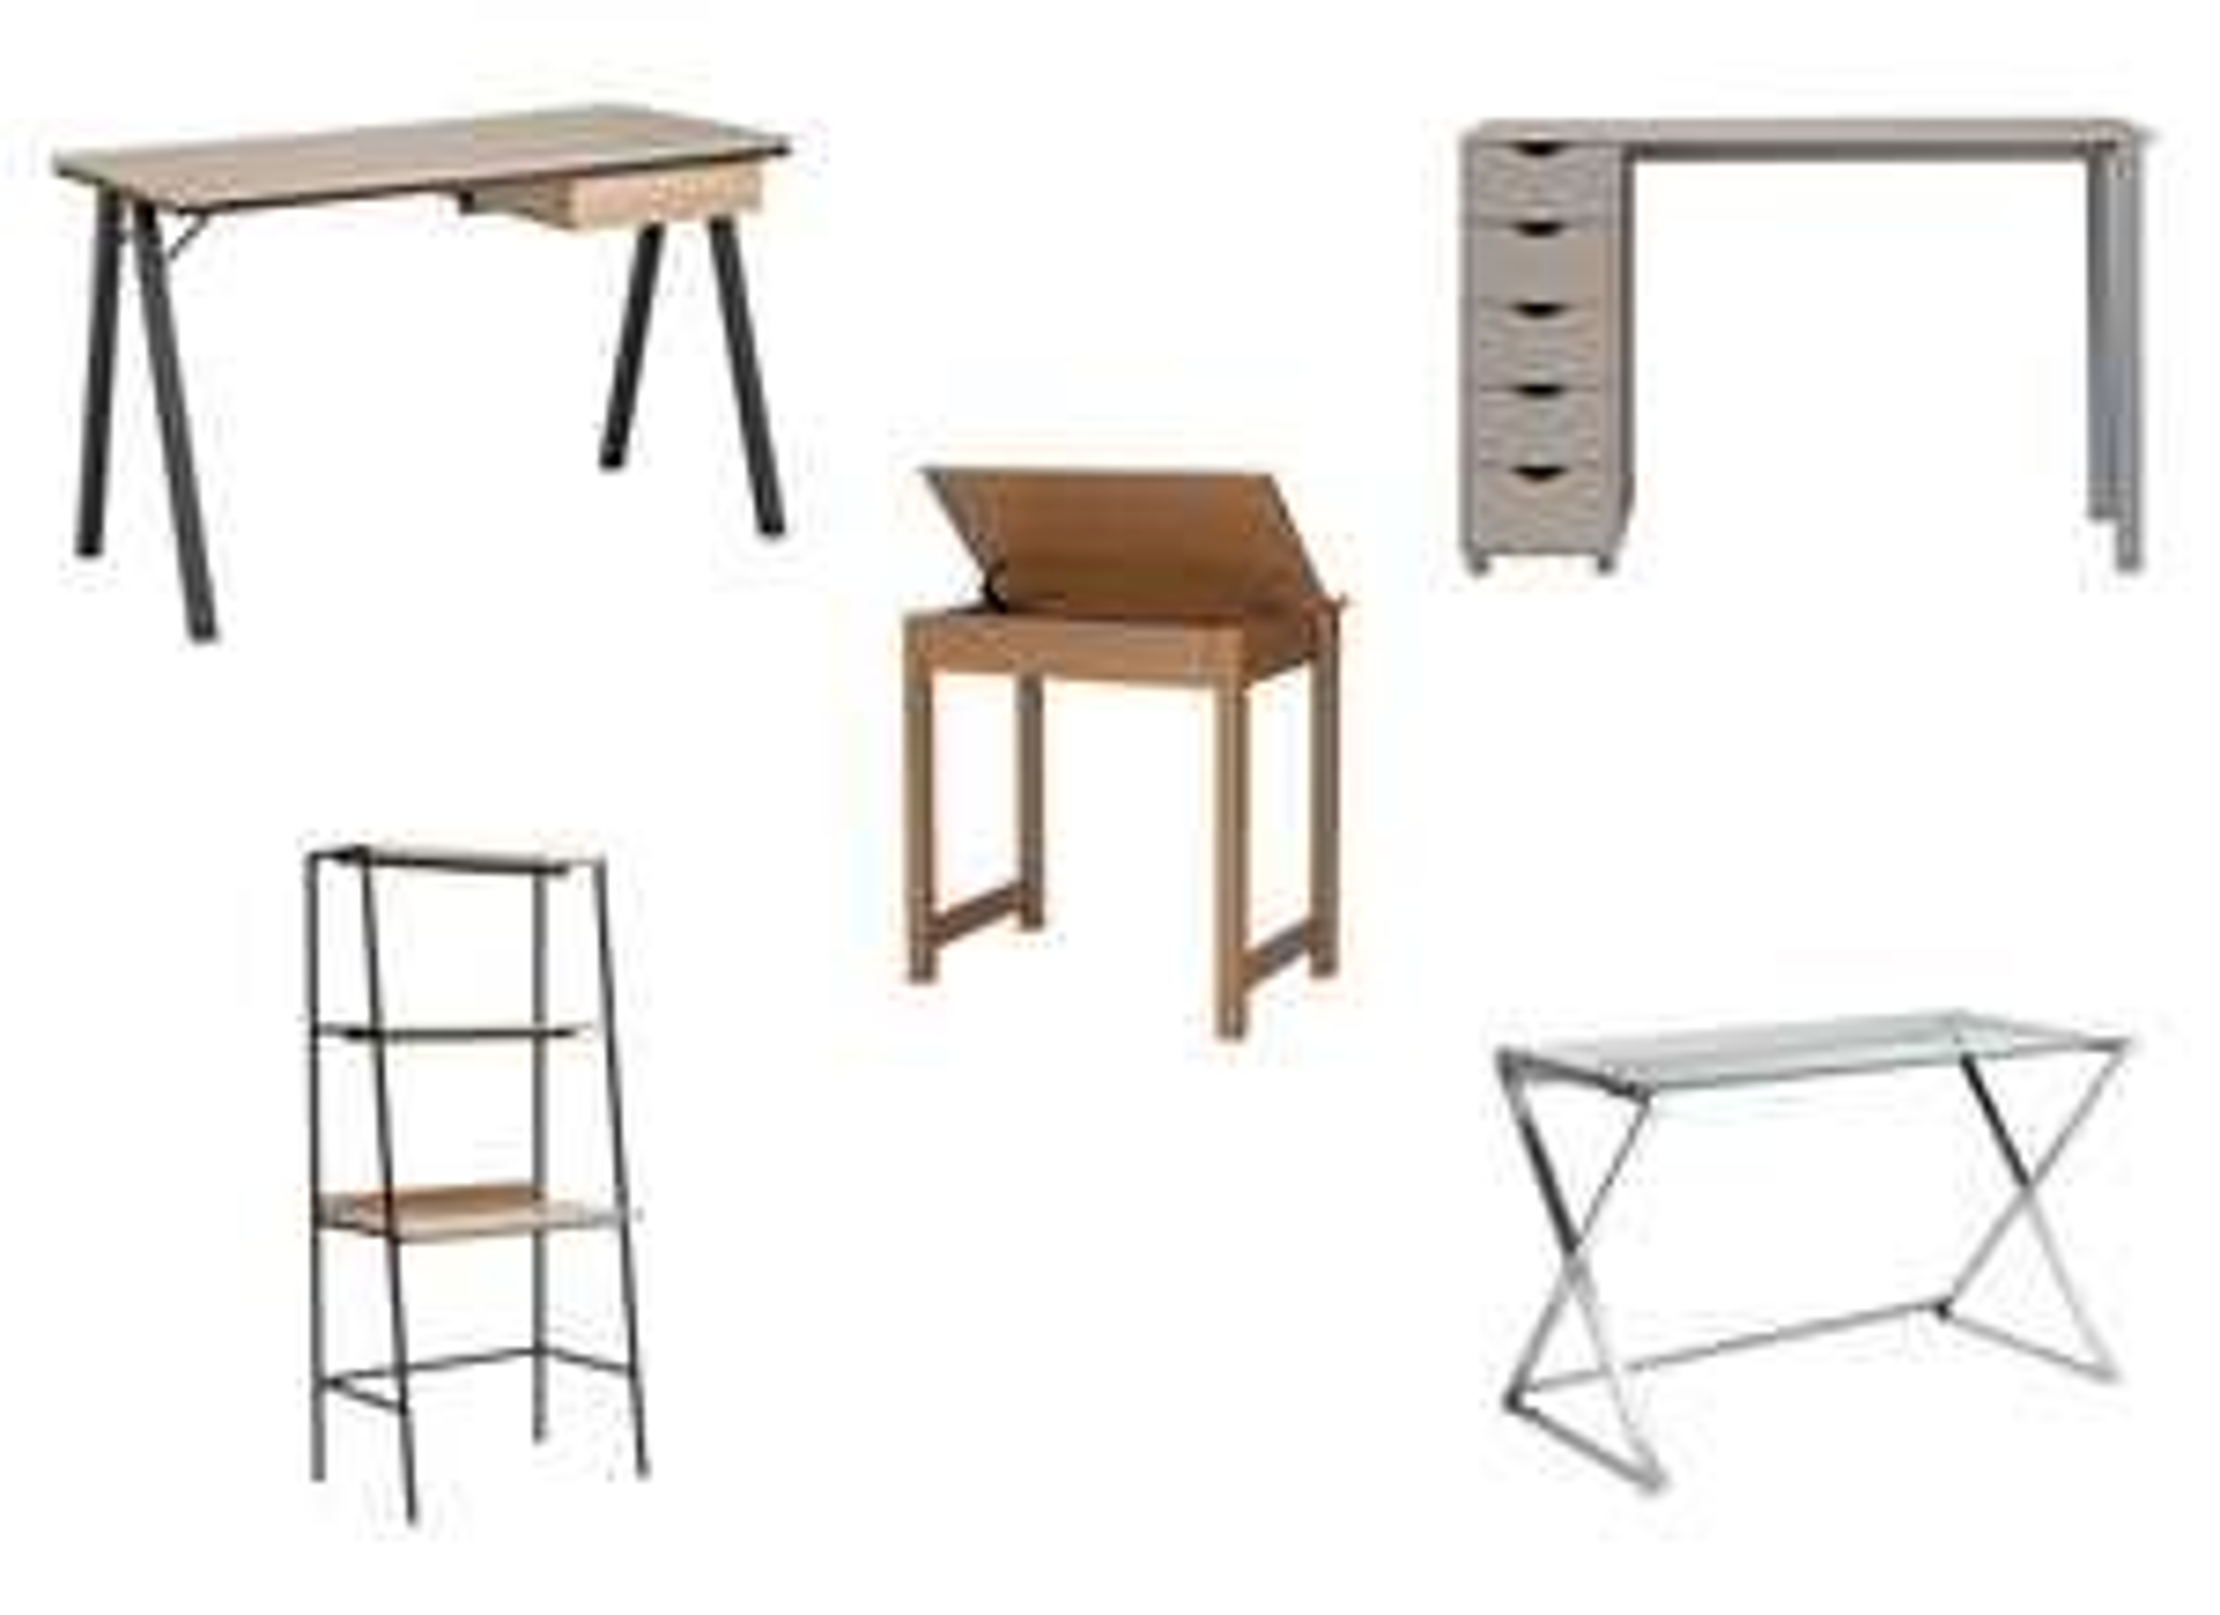 Office Desks on Half Price Sale - e.g. Denbigh Oak Effect - £17.49 @ Argos (+More offers)